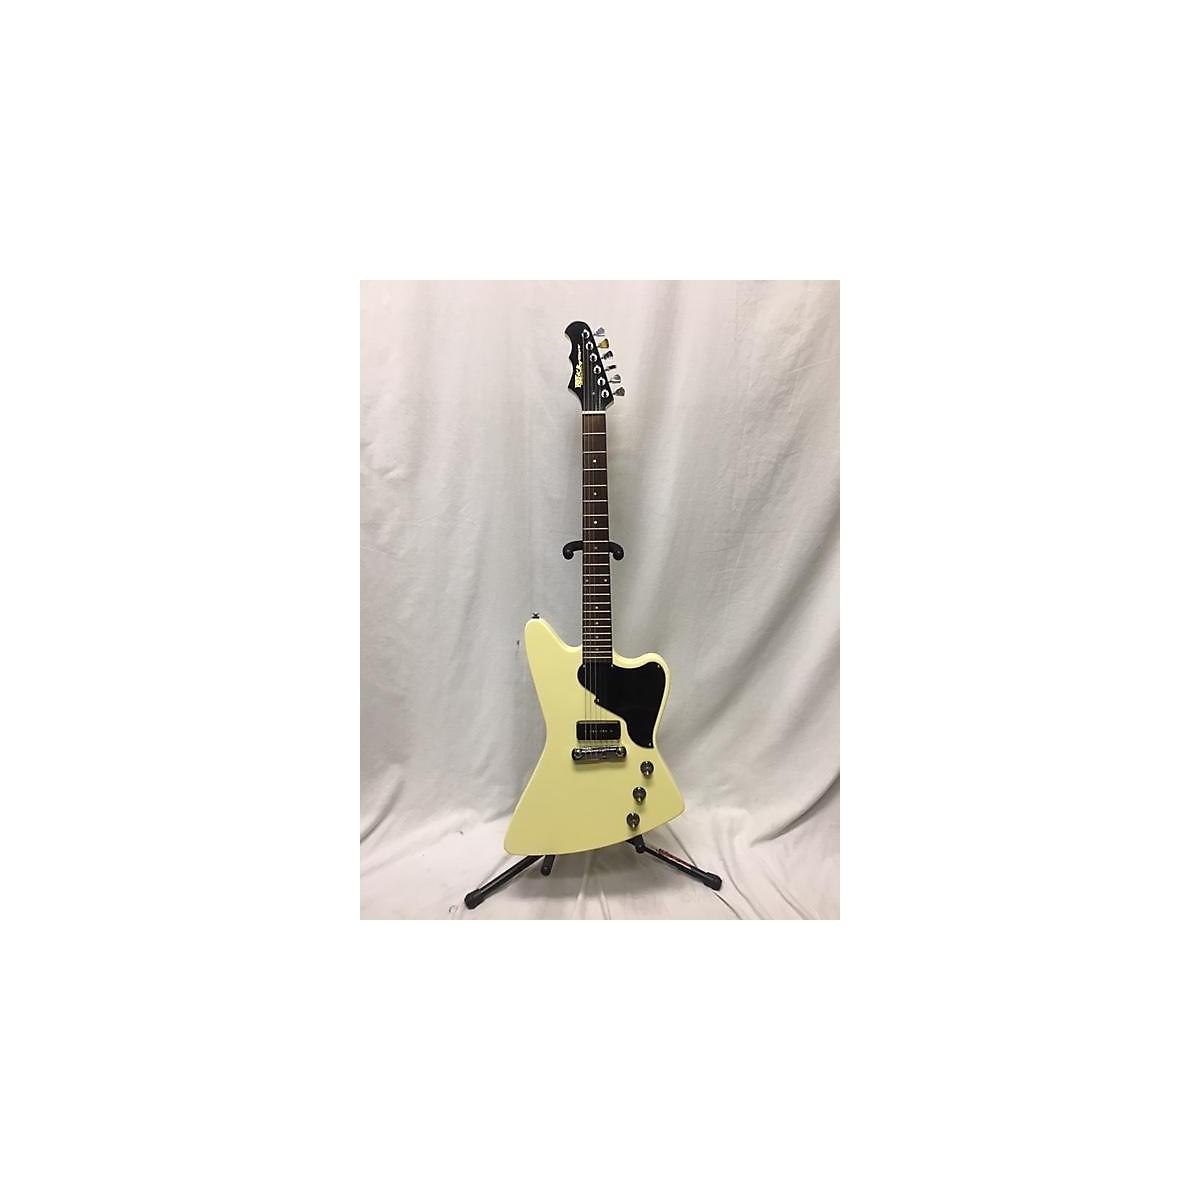 Fret-King BLACK LABEL ESPRIT Solid Body Electric Guitar